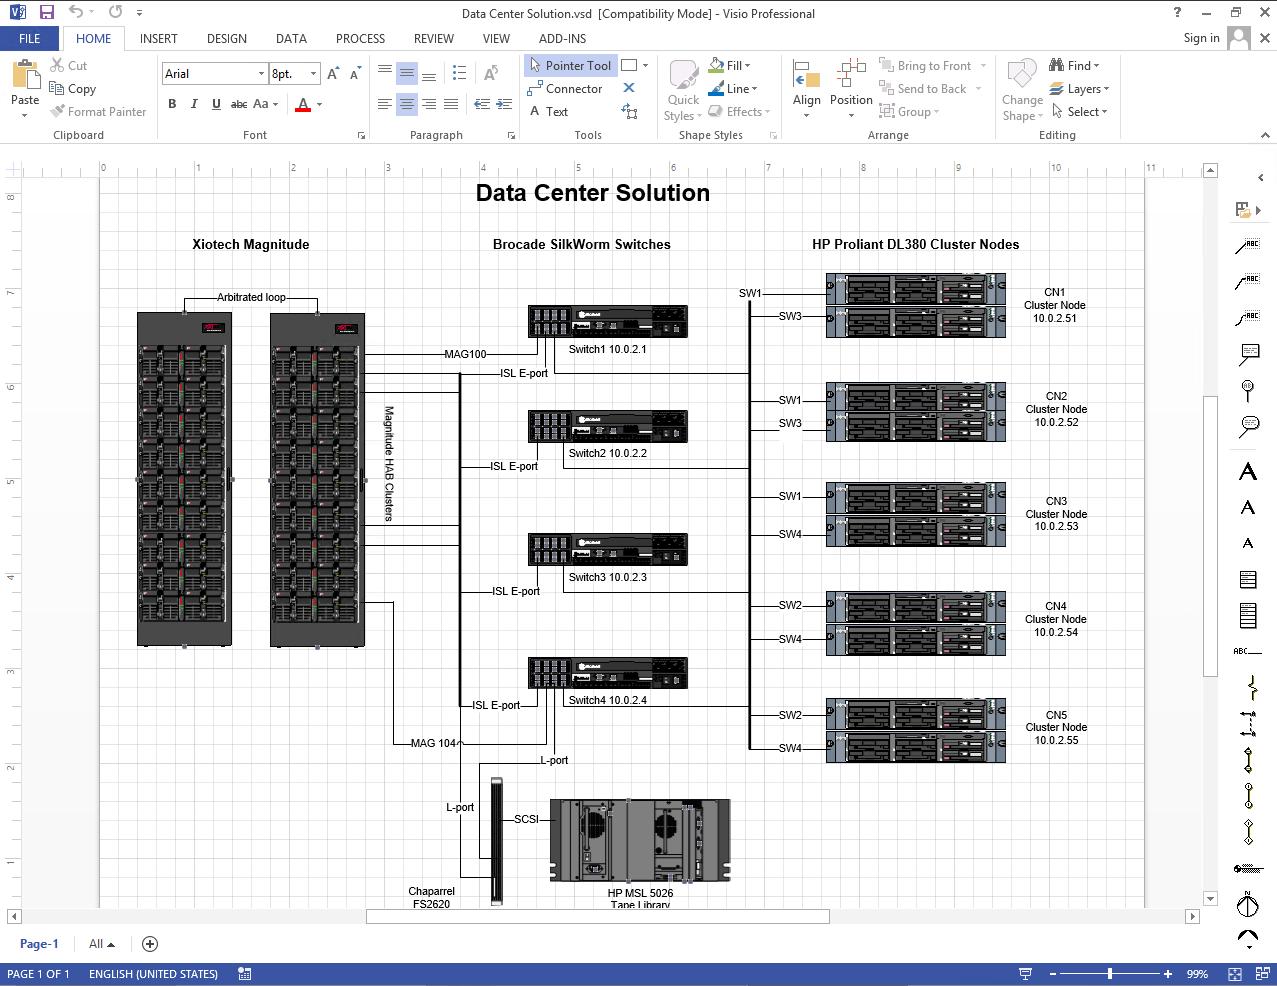 [ANLQ_8698]  24 Good Sample Of Visio Stencils For Network Diagrams Download Ideas,  http://bookingritzcarlton.info/24-good-sample-of-vis… | Data center,  Computer network, Diagram | Visio Network Wiring Diagram Template |  | Pinterest